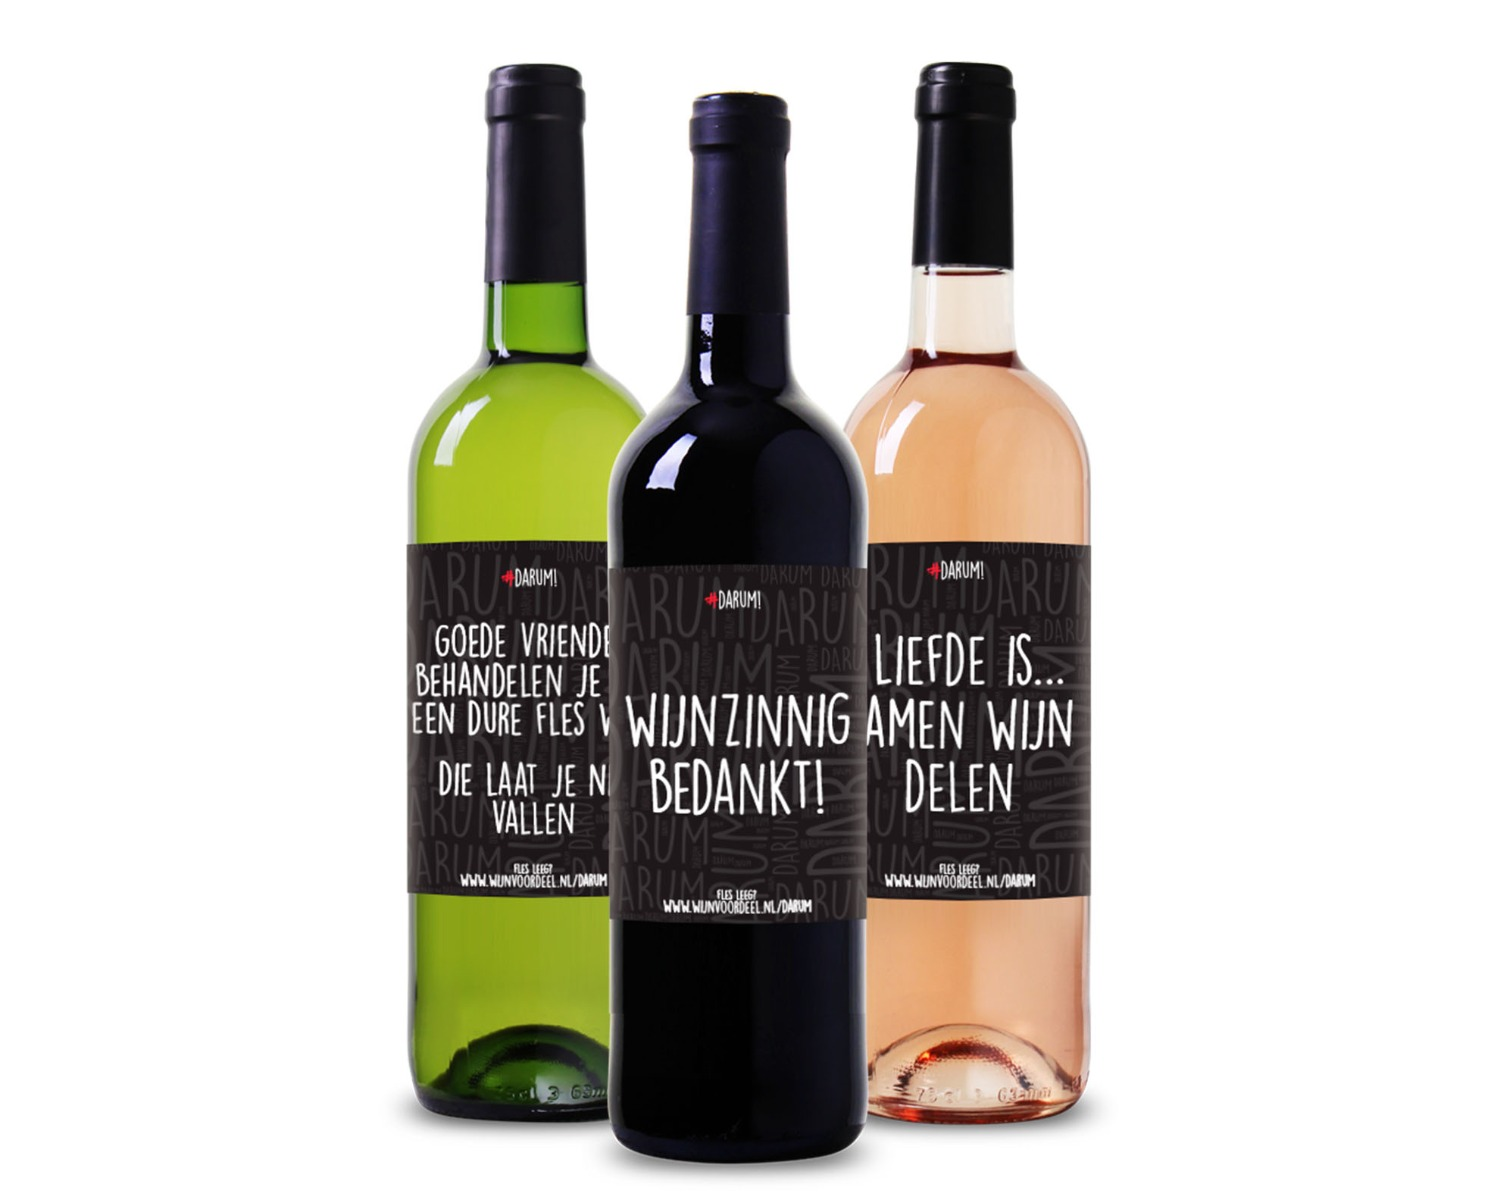 #Darum Wijnpakket Mix